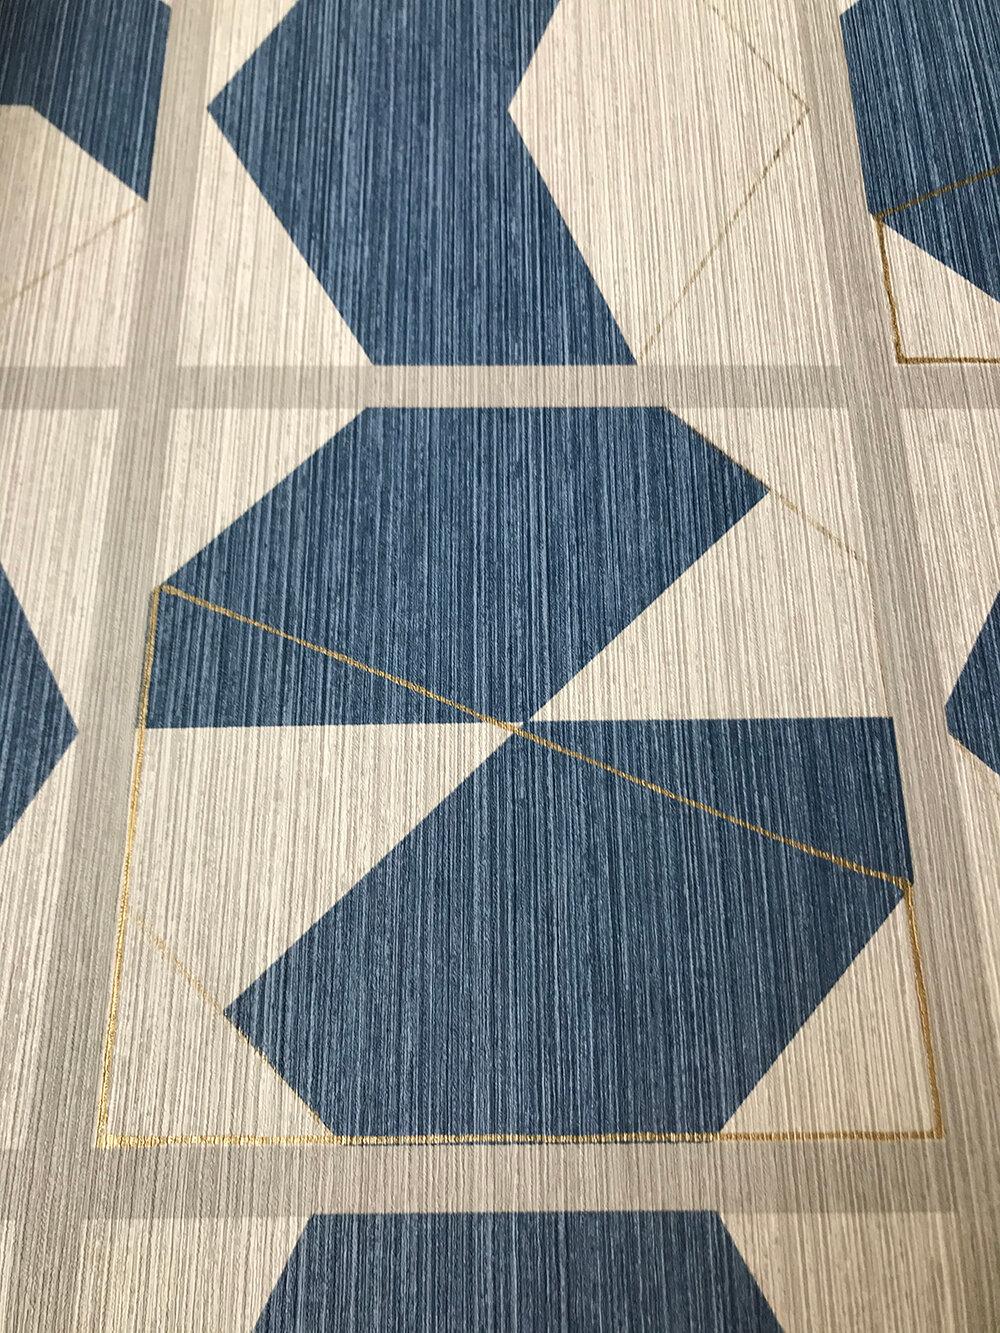 Kutani Vinyl Wallpaper - Indigo/ Ivory - by Osborne & Little